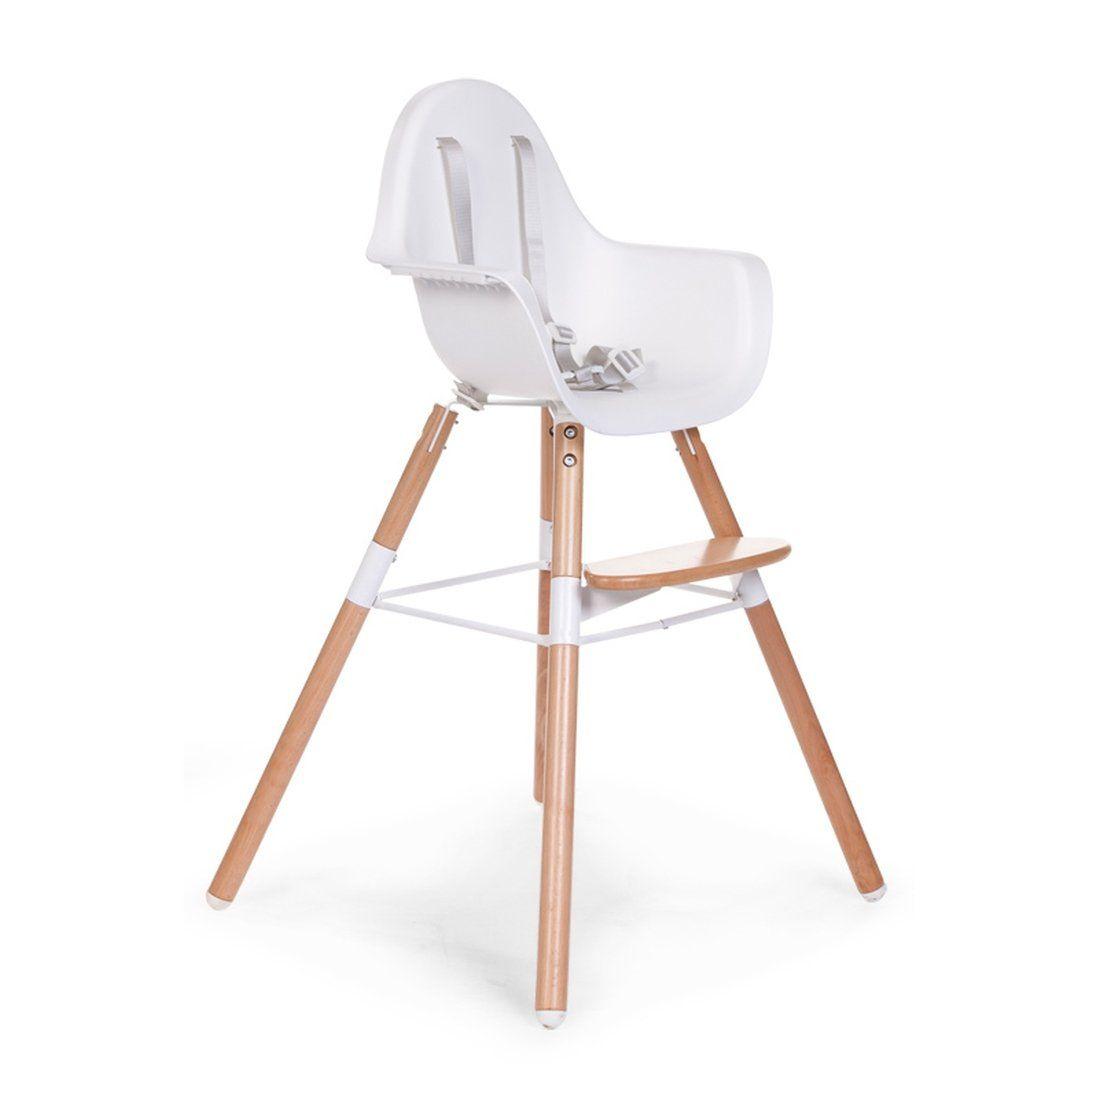 Chaise Haute Evolu 3 En 1 Childwood Amazon Fr Bebes Puericulture High Chair Chair Interior Inspiration